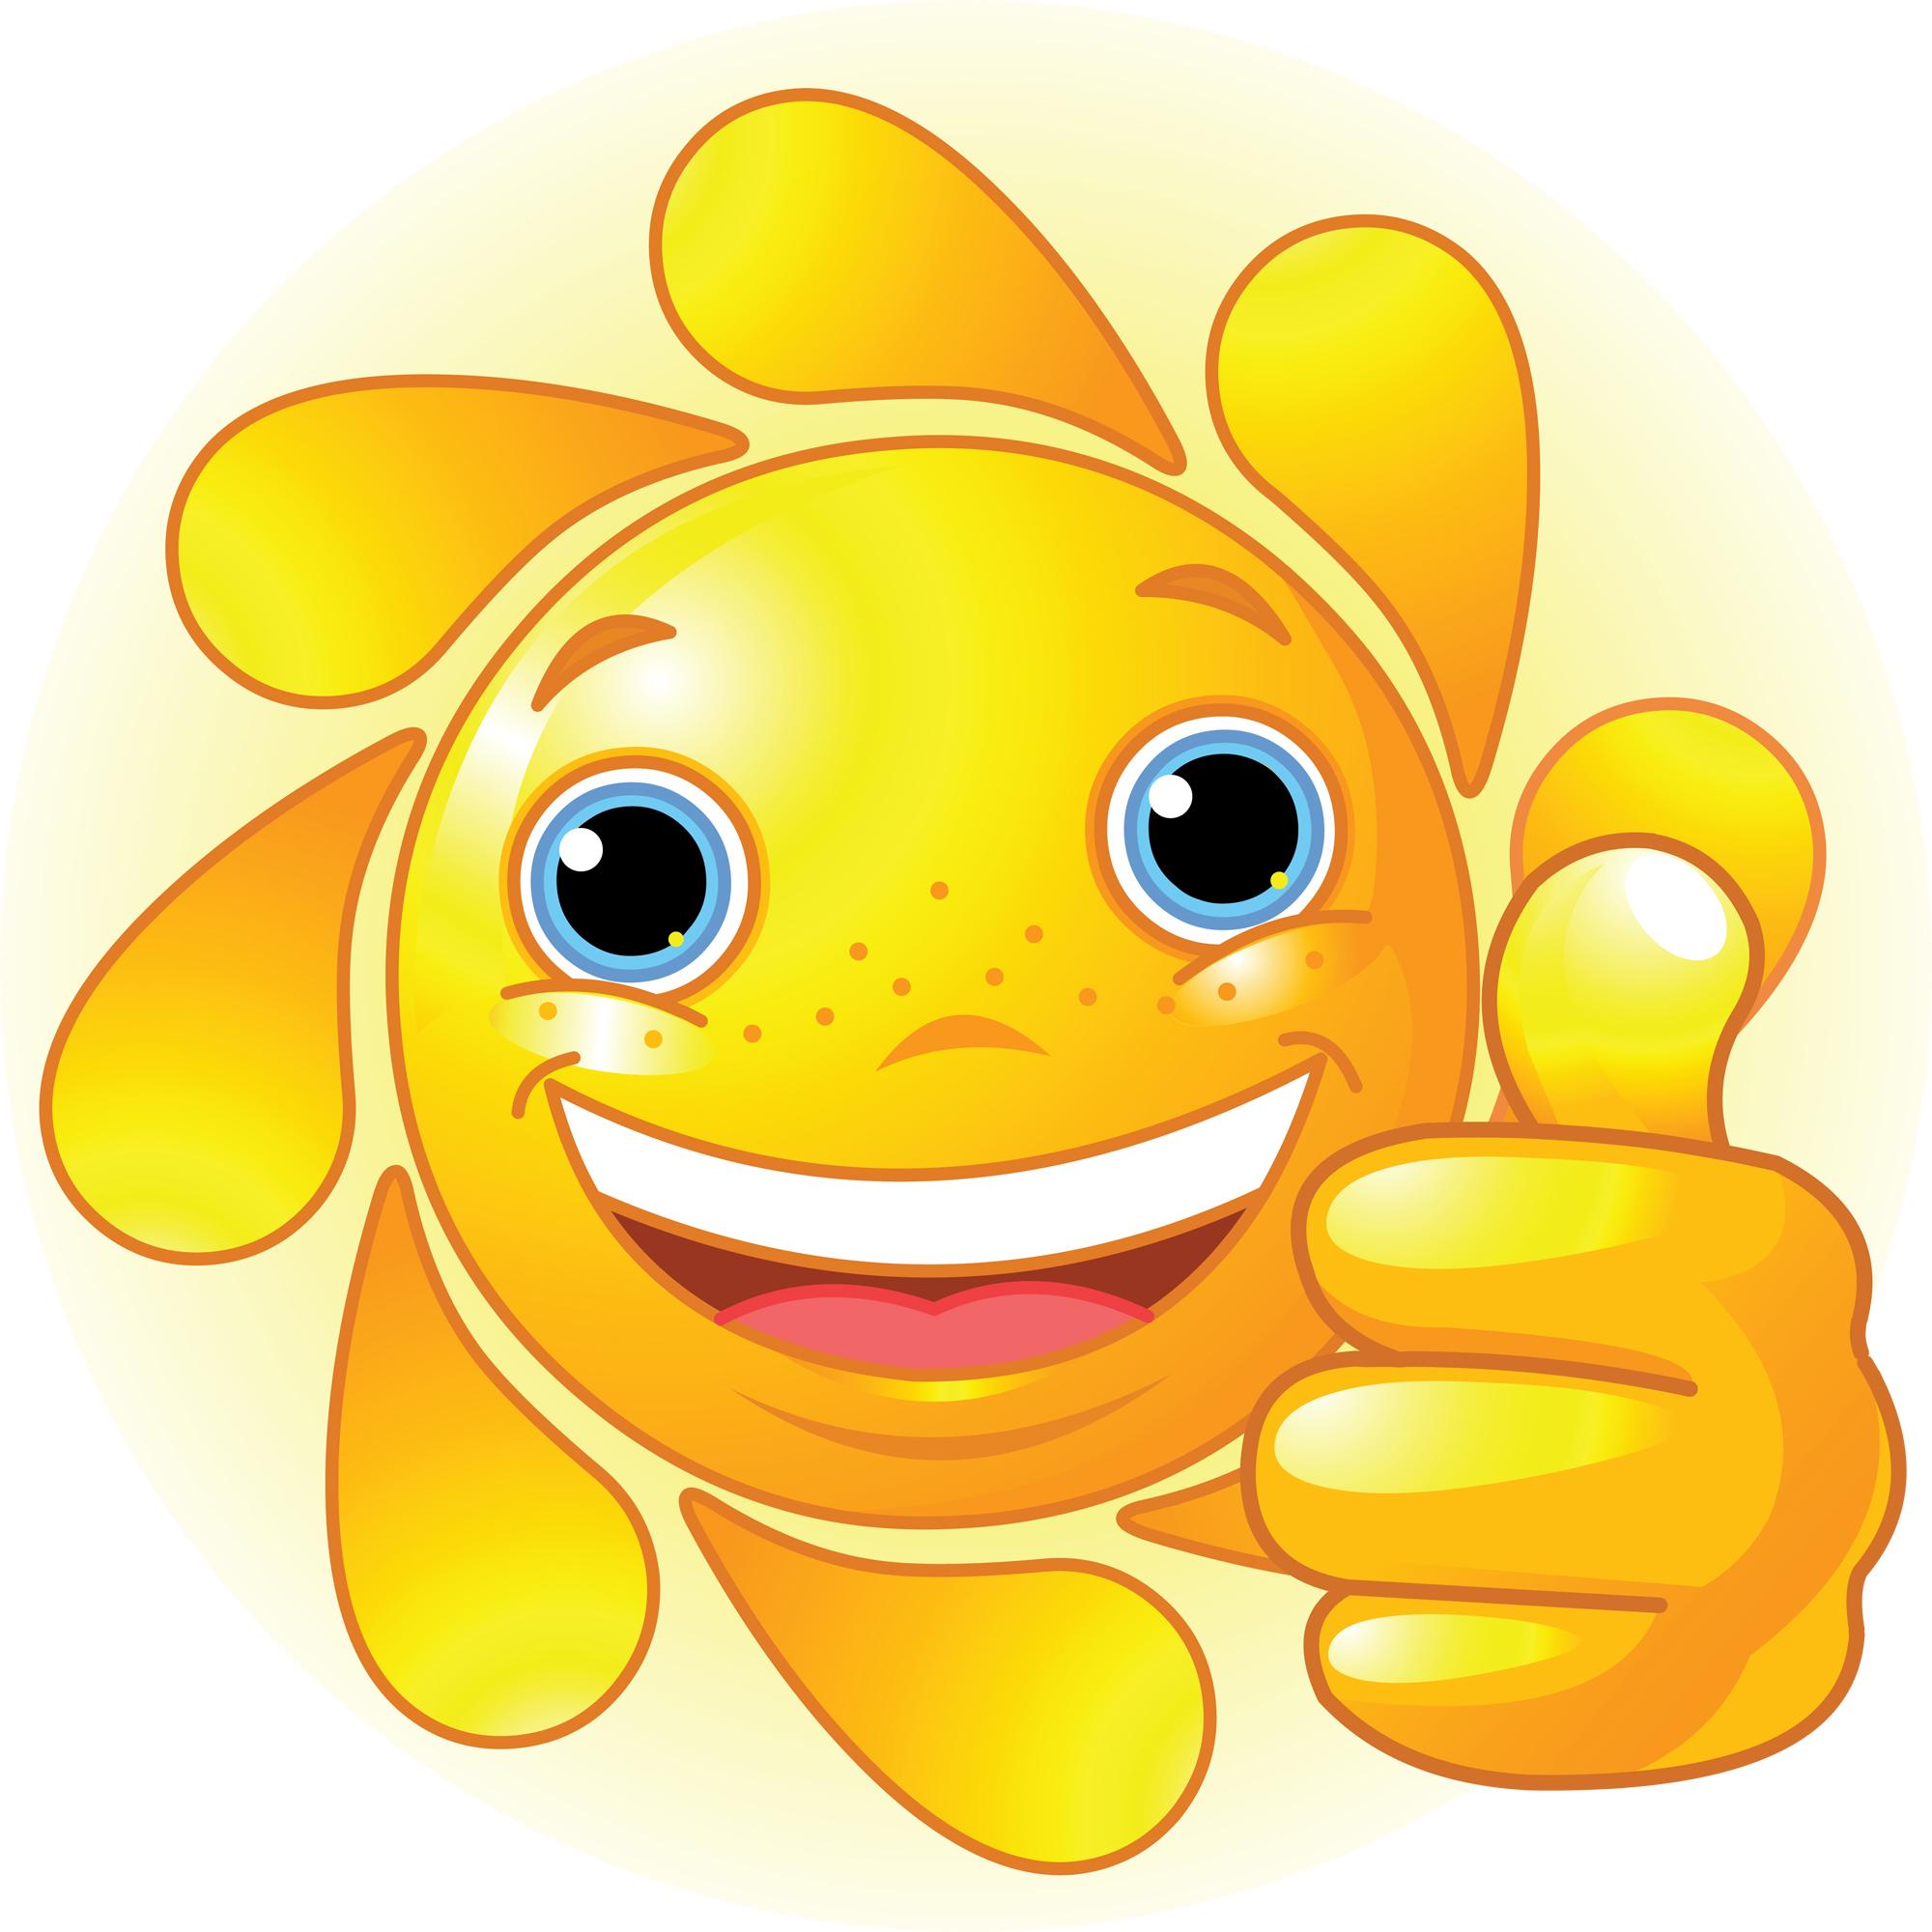 2000x2000 Sun clipart smile